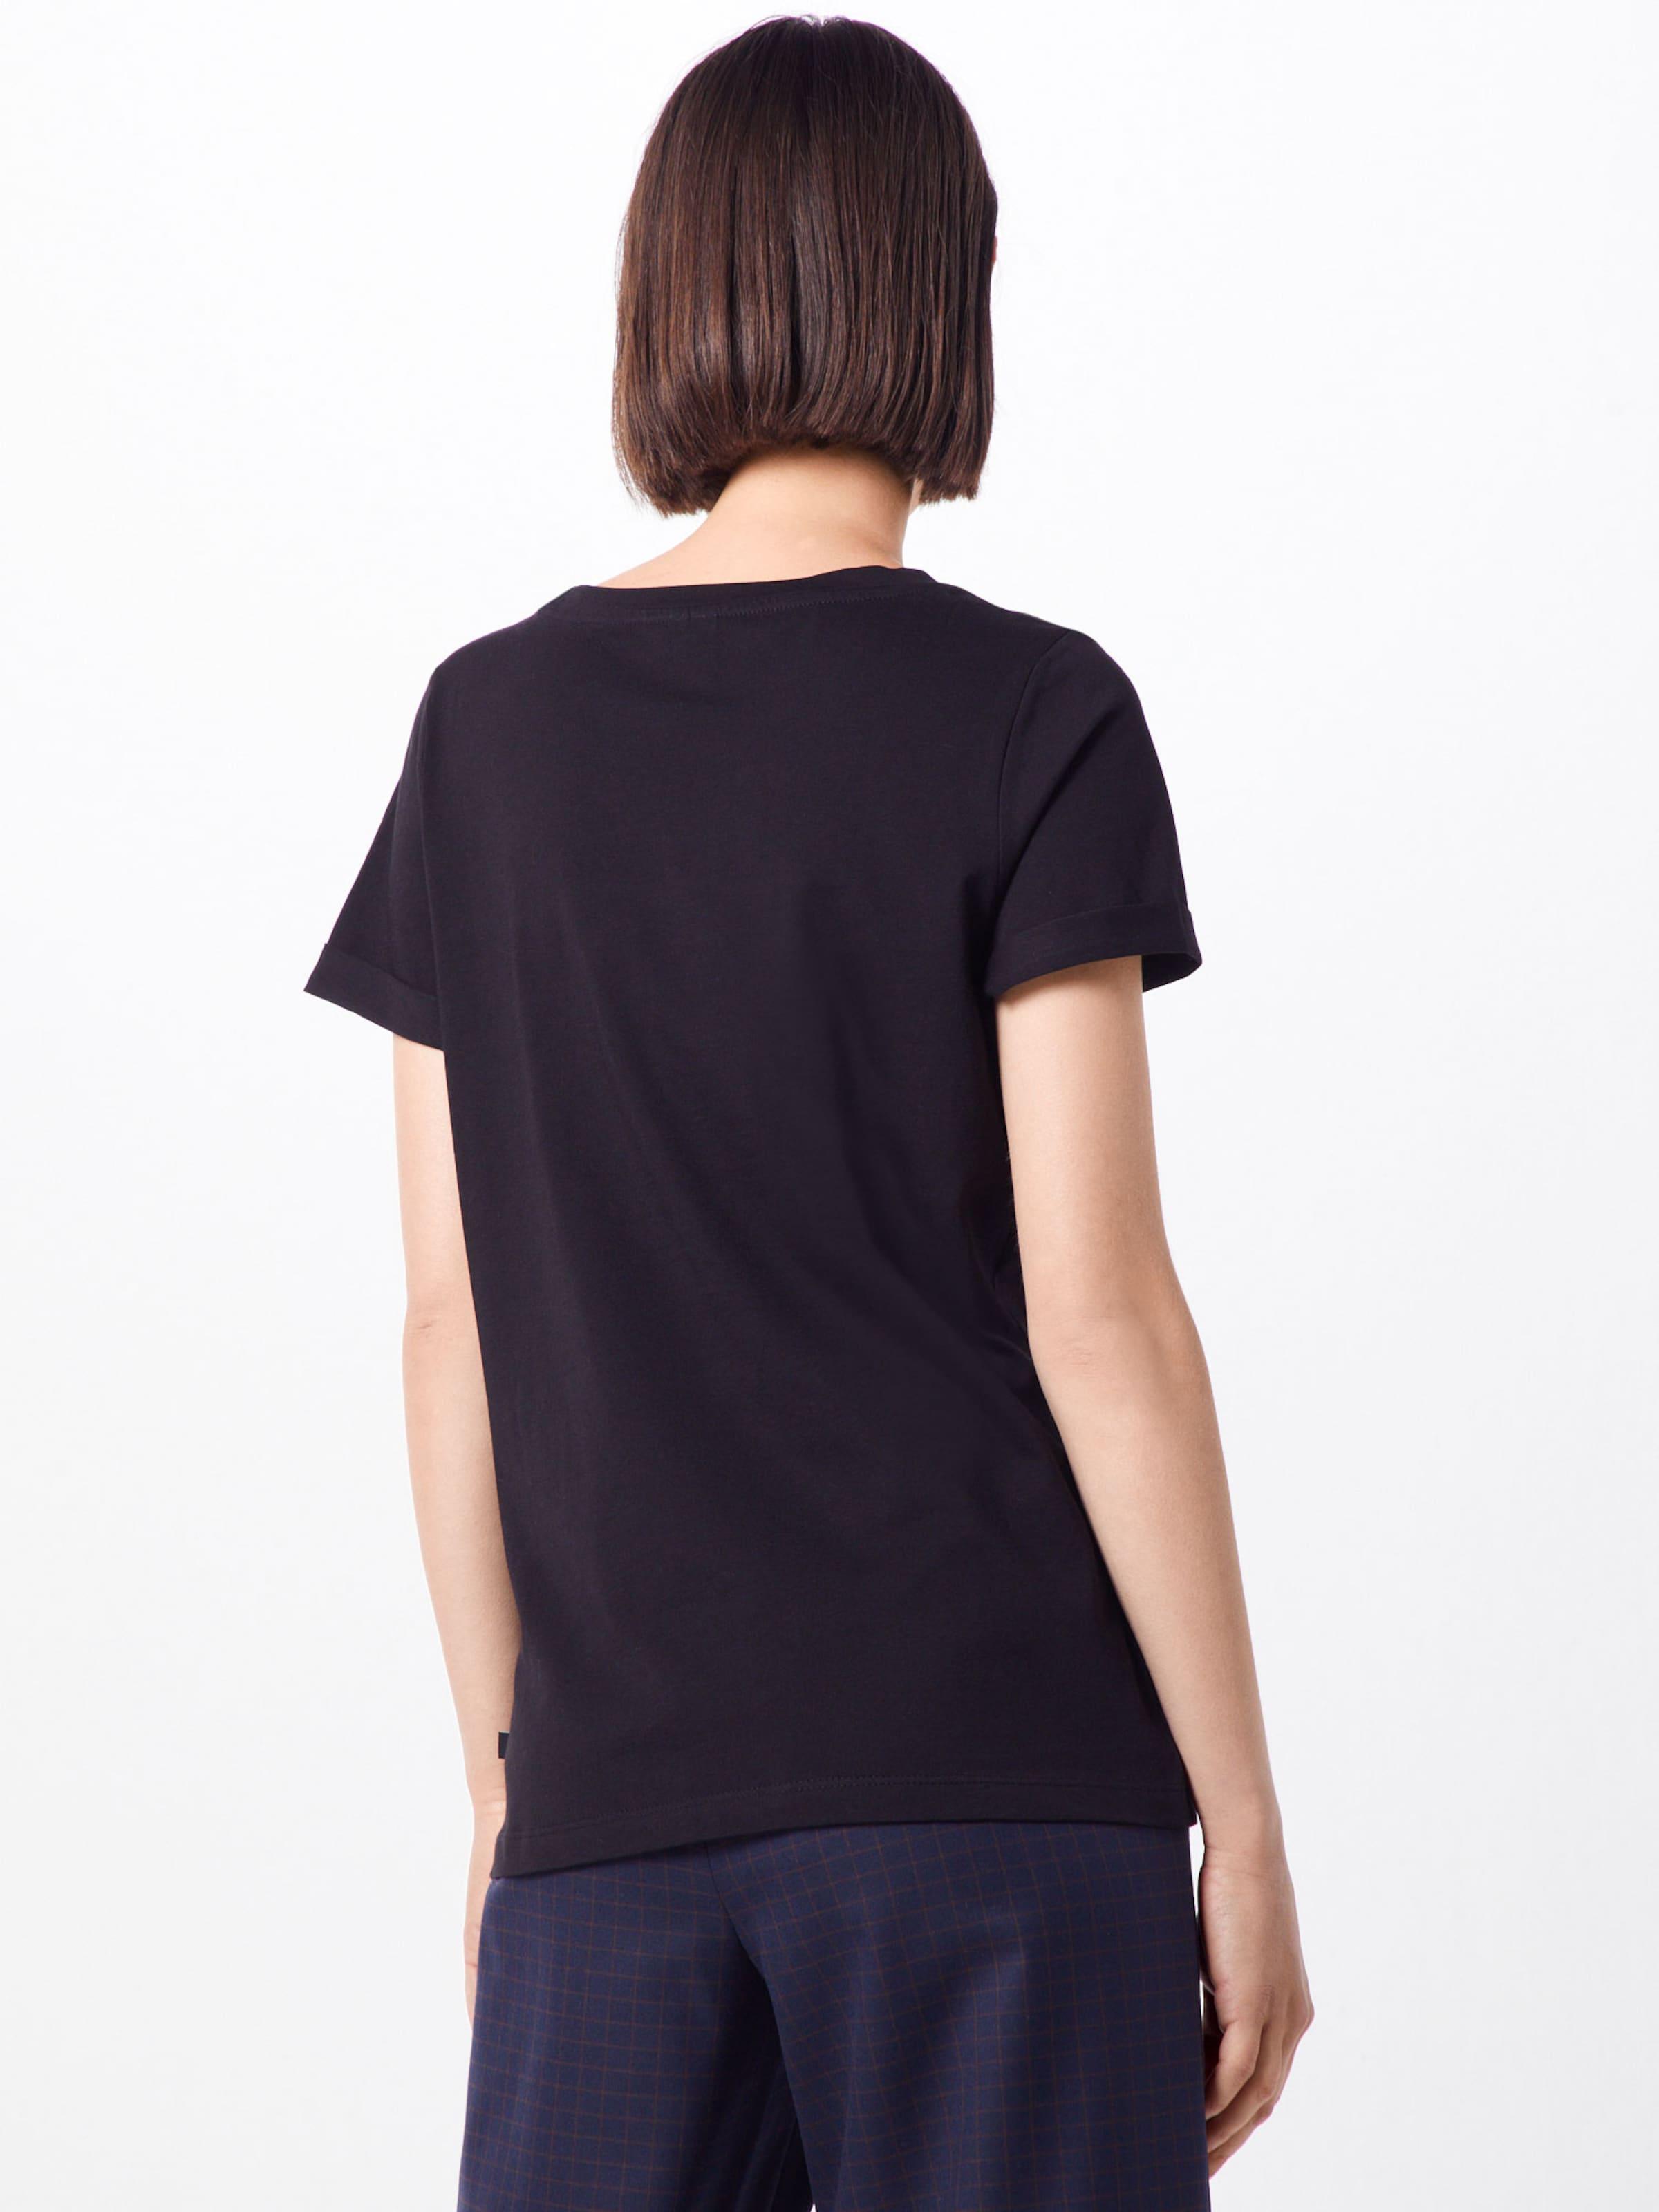 s shirt Schwarz T In Q Designed By QtsrhdCx